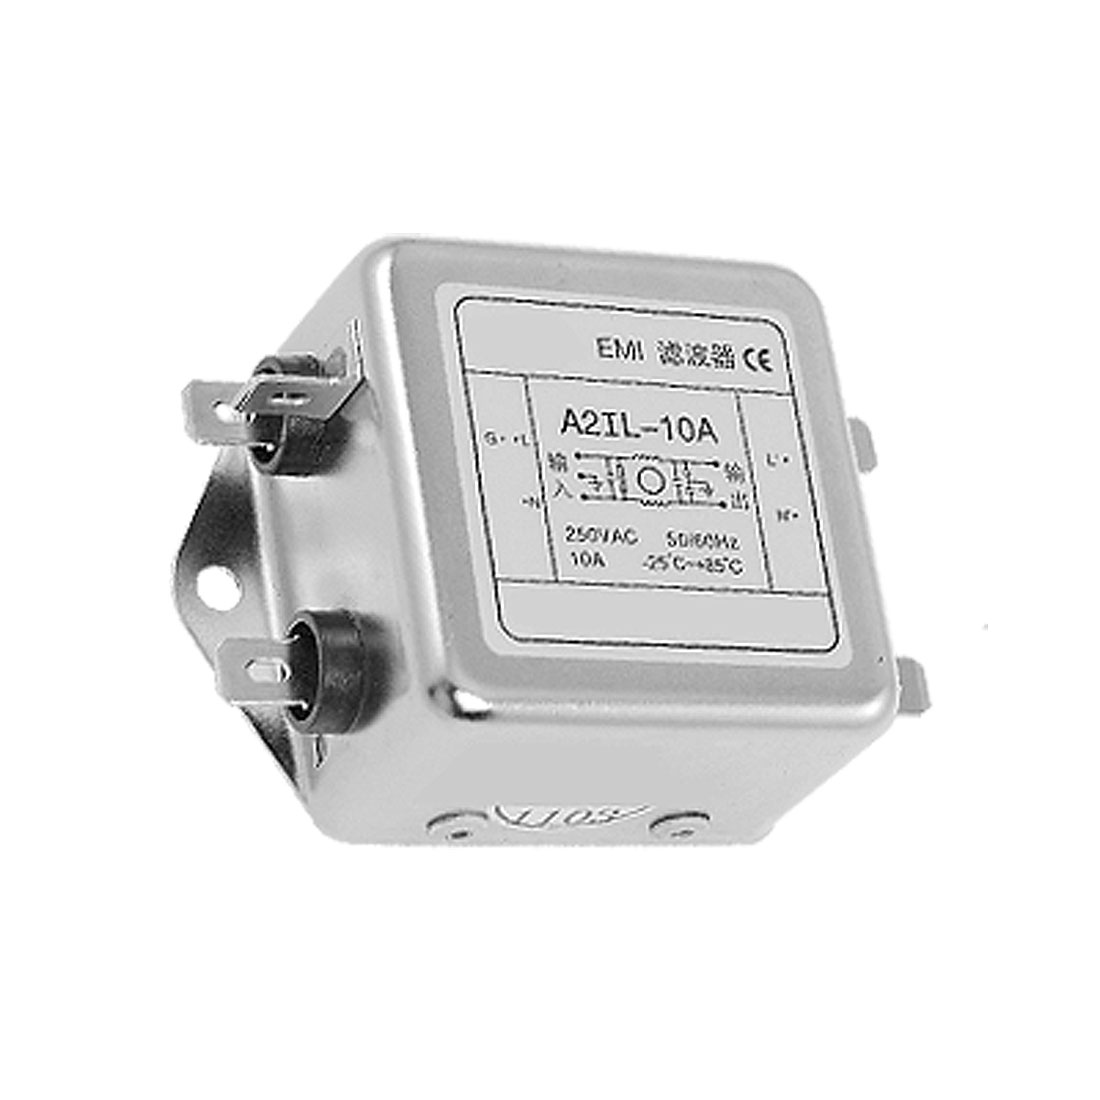 A2IL-10A AC 250V 10A AC Power Single Phase EMI Filter